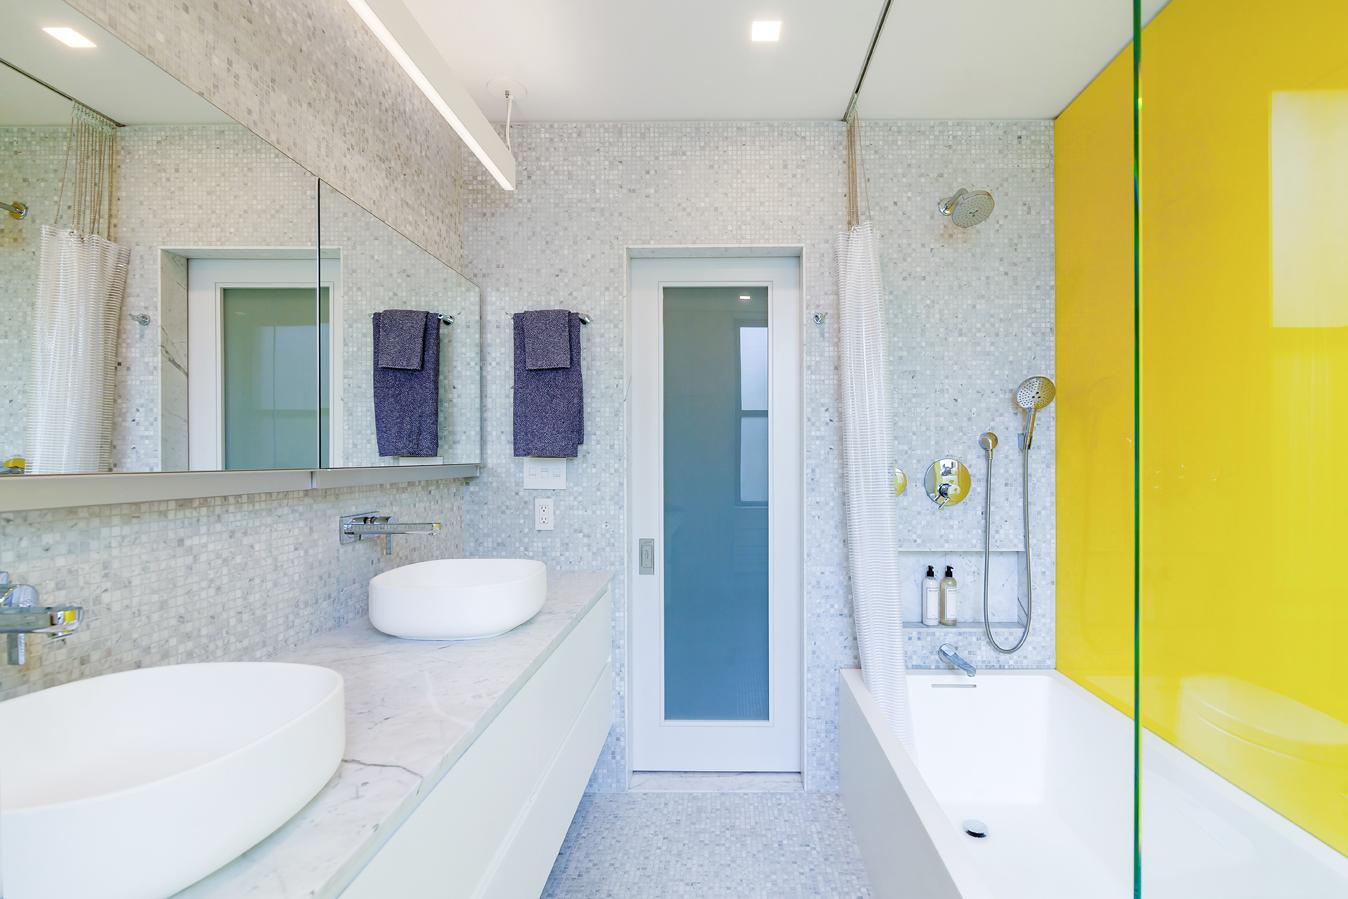 bathroom-interior-architecture-new-york-03.JPG